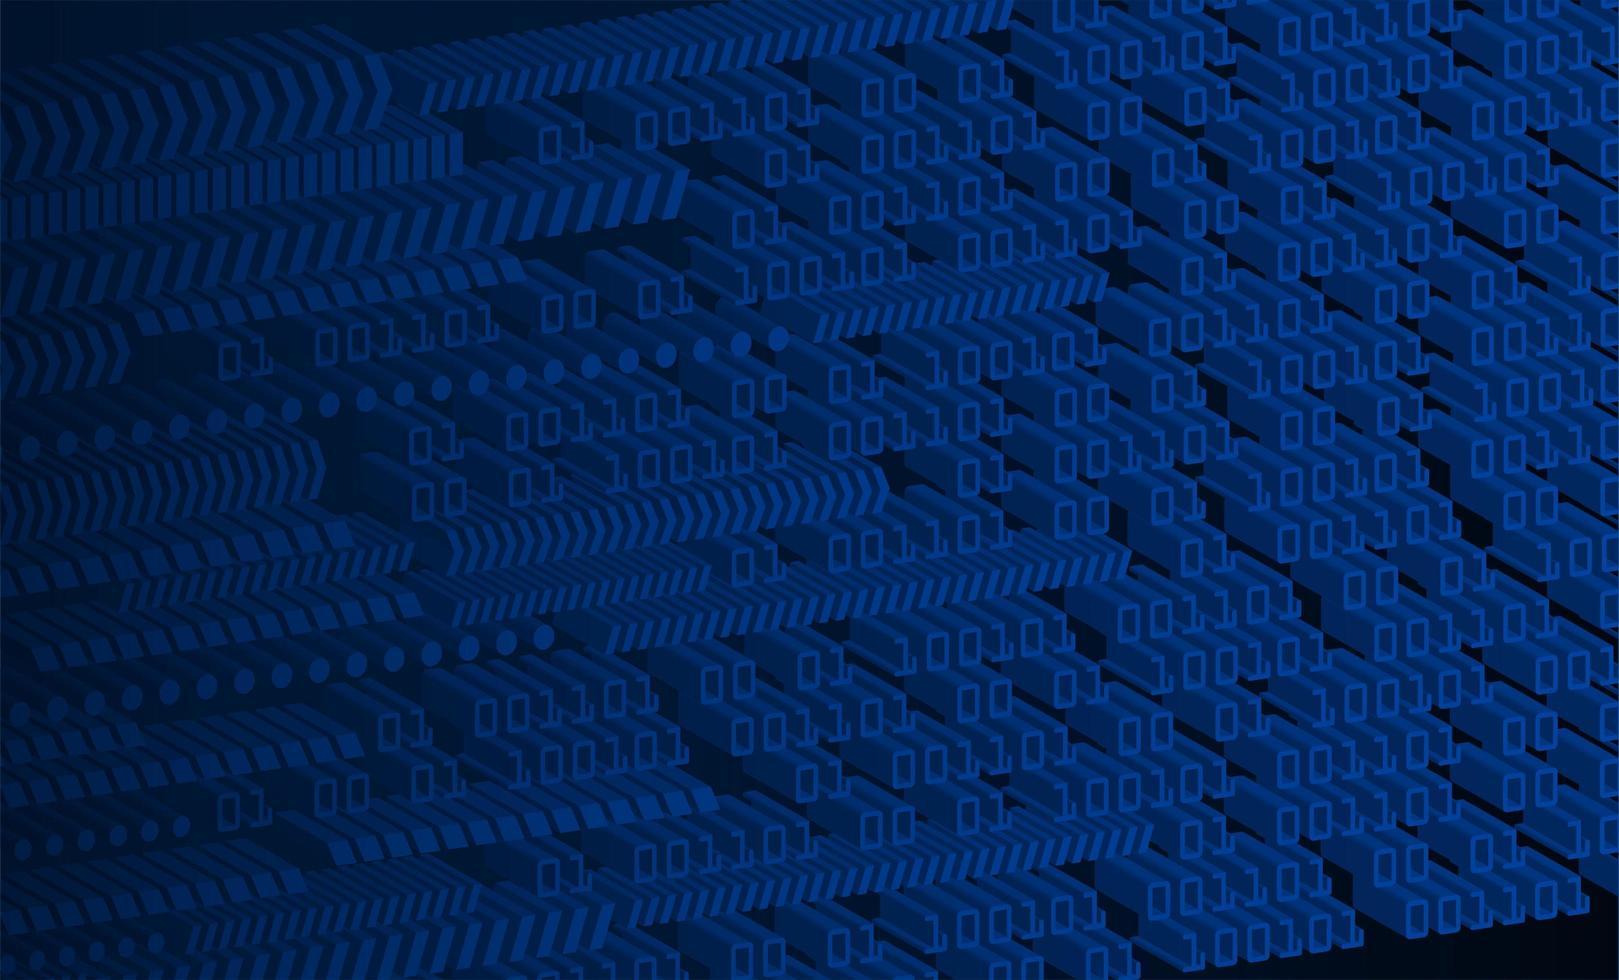 blå 3d binär cyberkretsbakgrund vektor